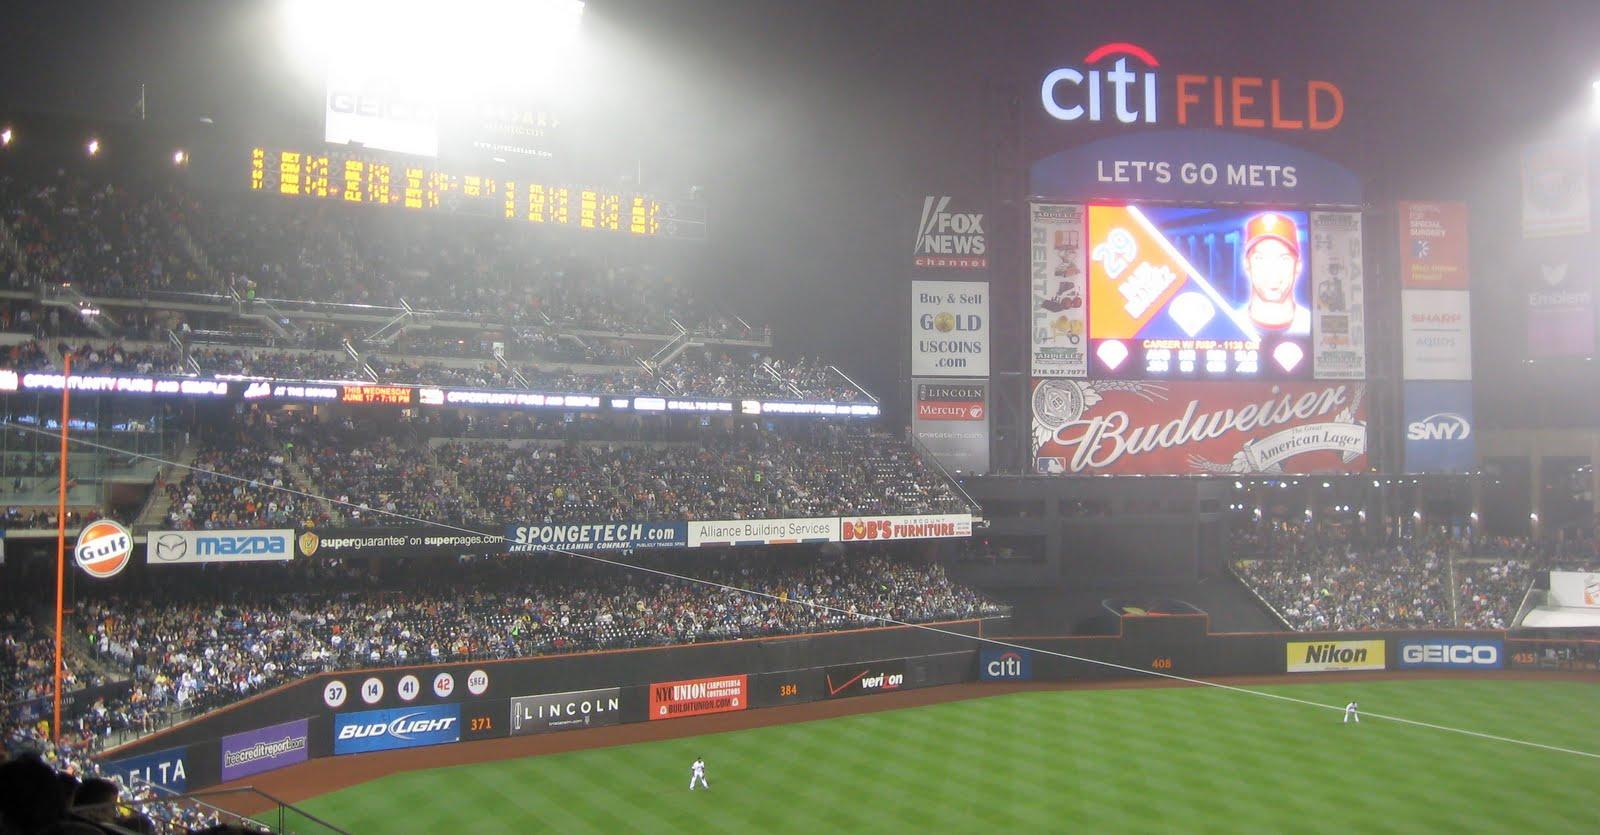 Citi field new dimensions pictures Citi Field, New York Mets ballpark - Ballparks of Baseball